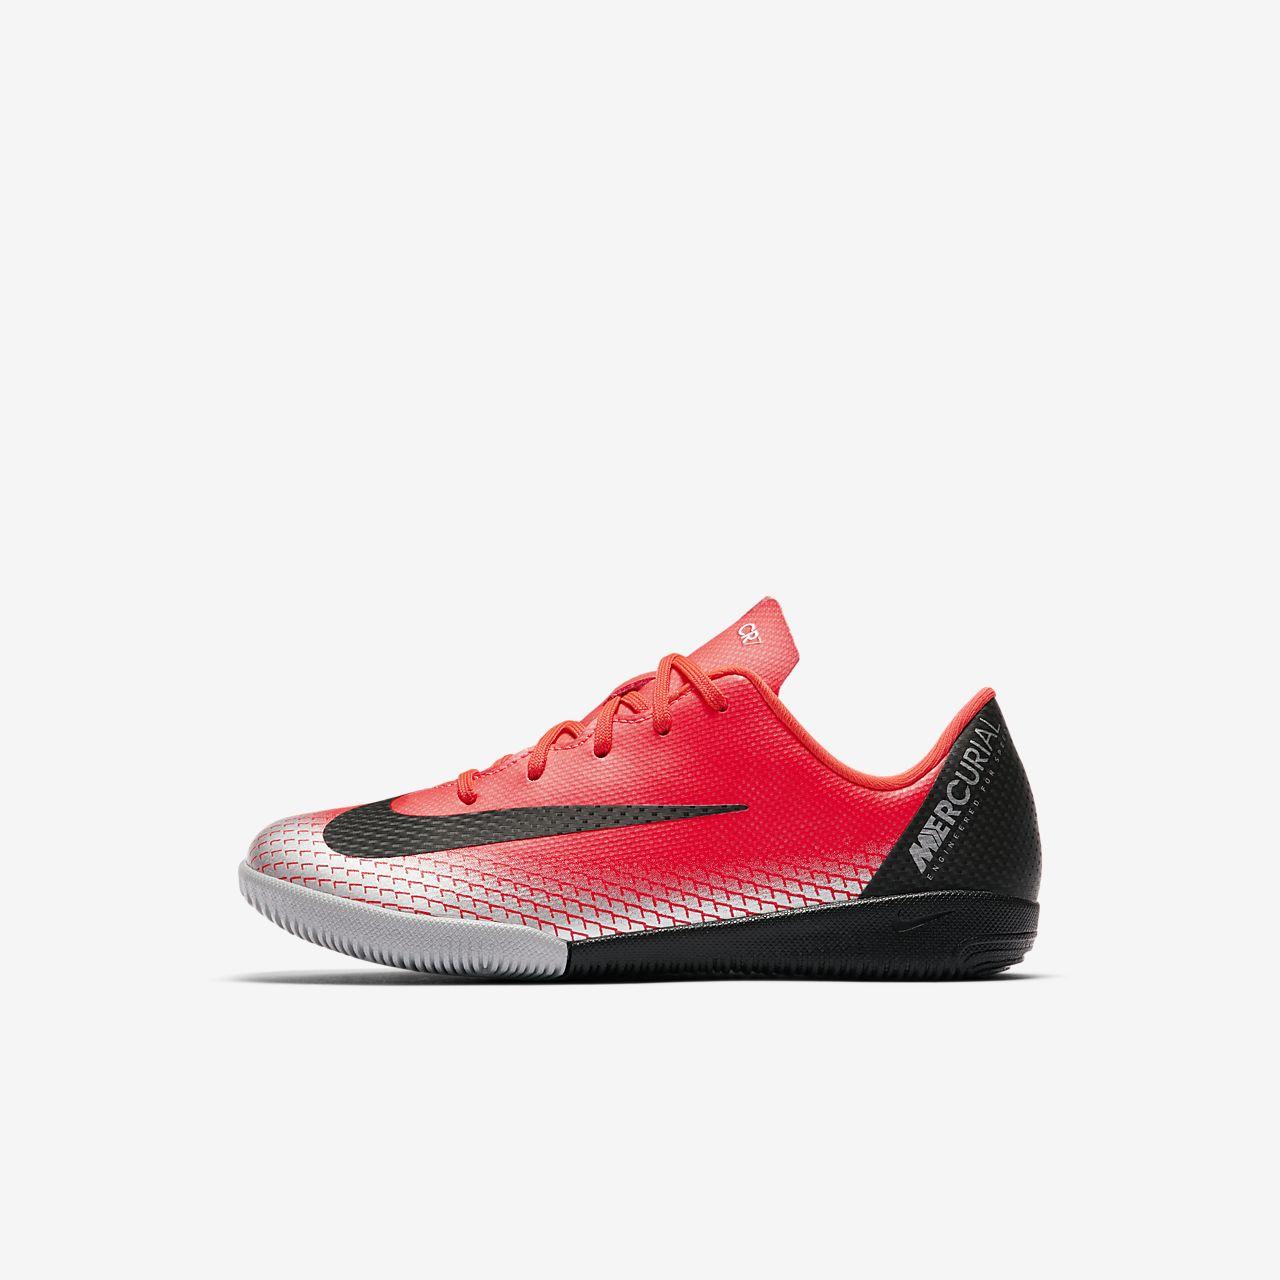 8bf4d87de ... Nike Jr. MercurialX Vapor XII Academy CR7 Younger Kids  Indoor Court  Football Shoe